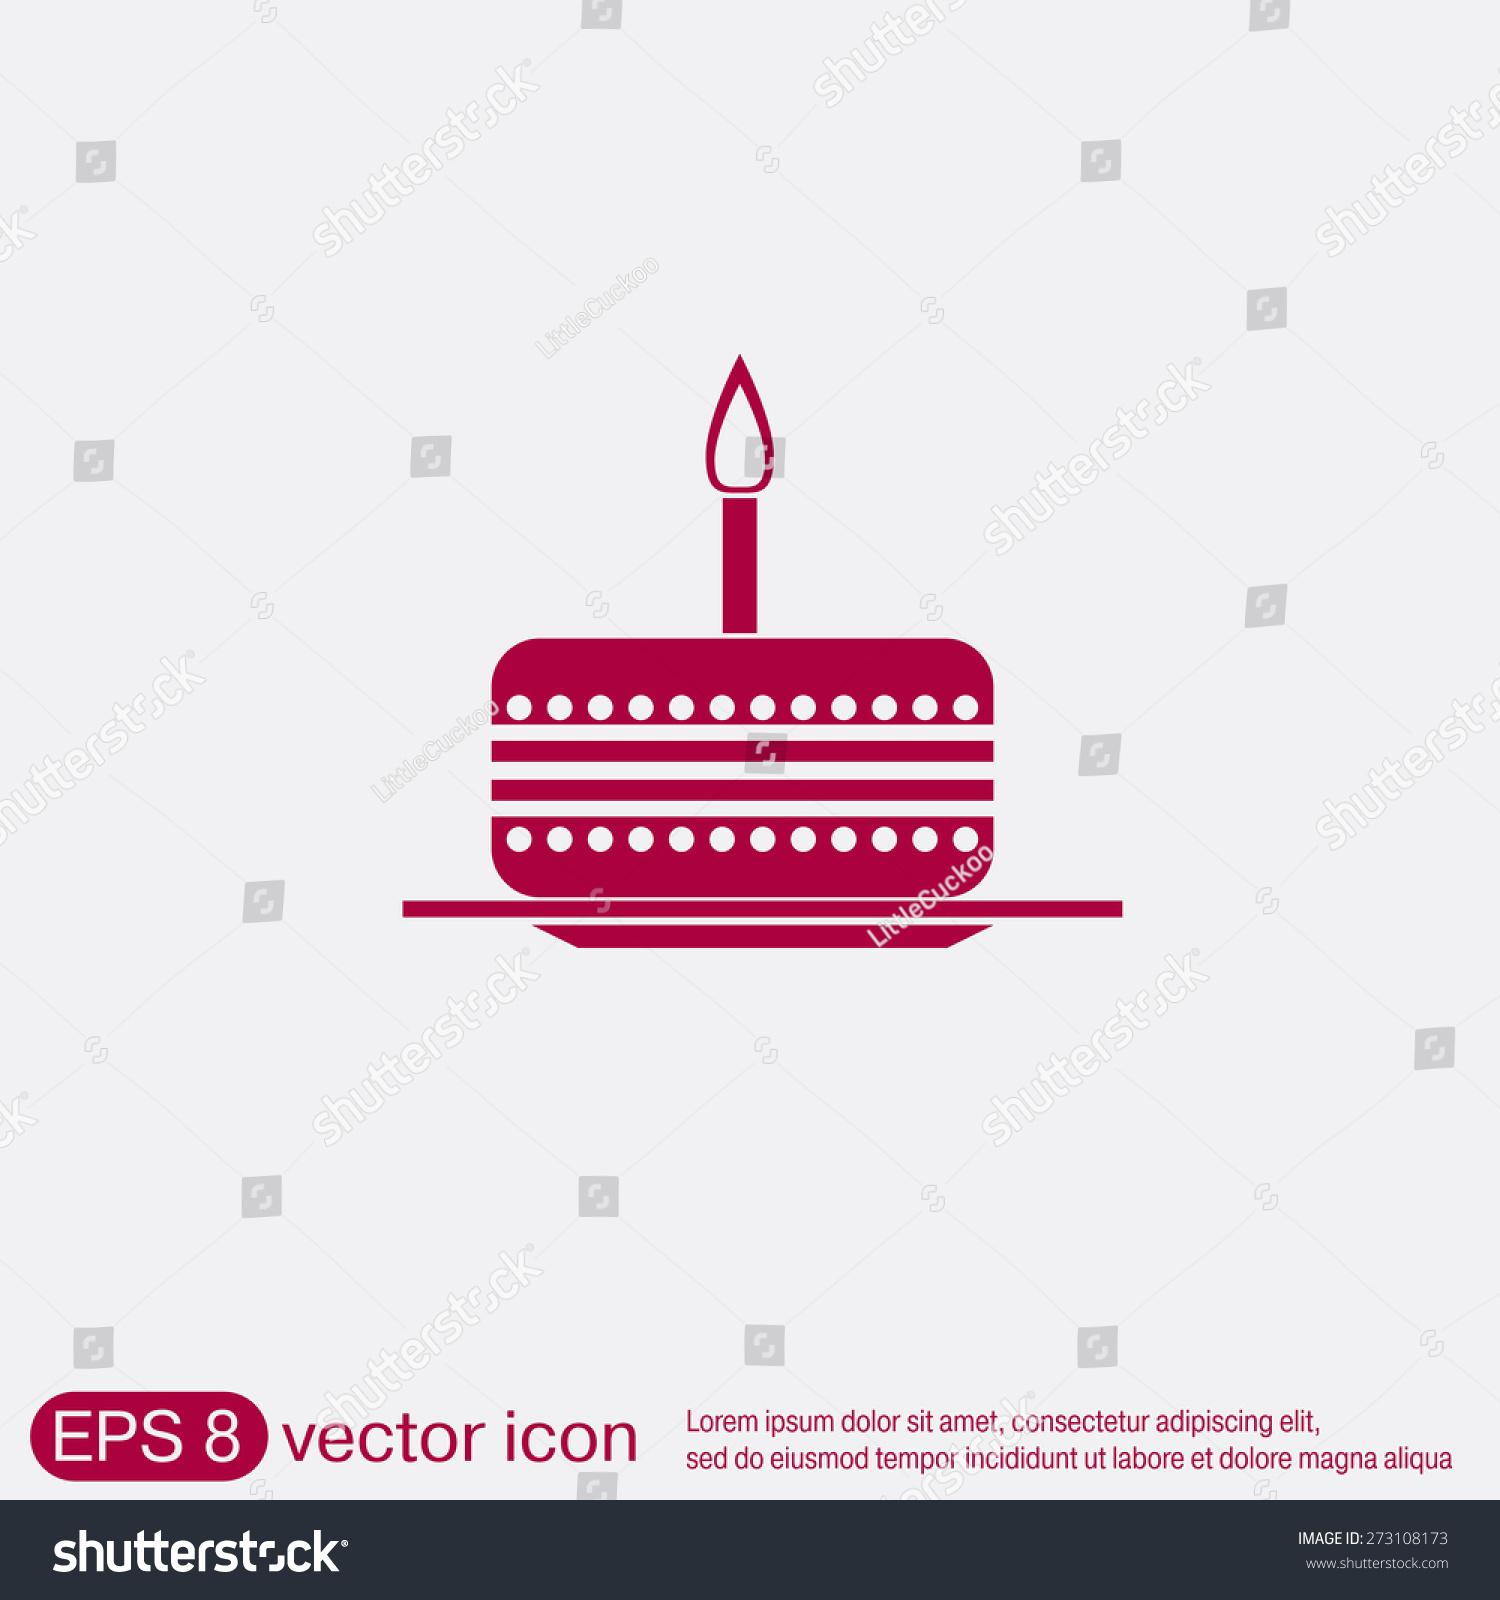 Birthday cake icon symbol cake celebrating stock vector 273108173 birthday cake icon symbol of cake celebrating the birthday of the loaf biocorpaavc